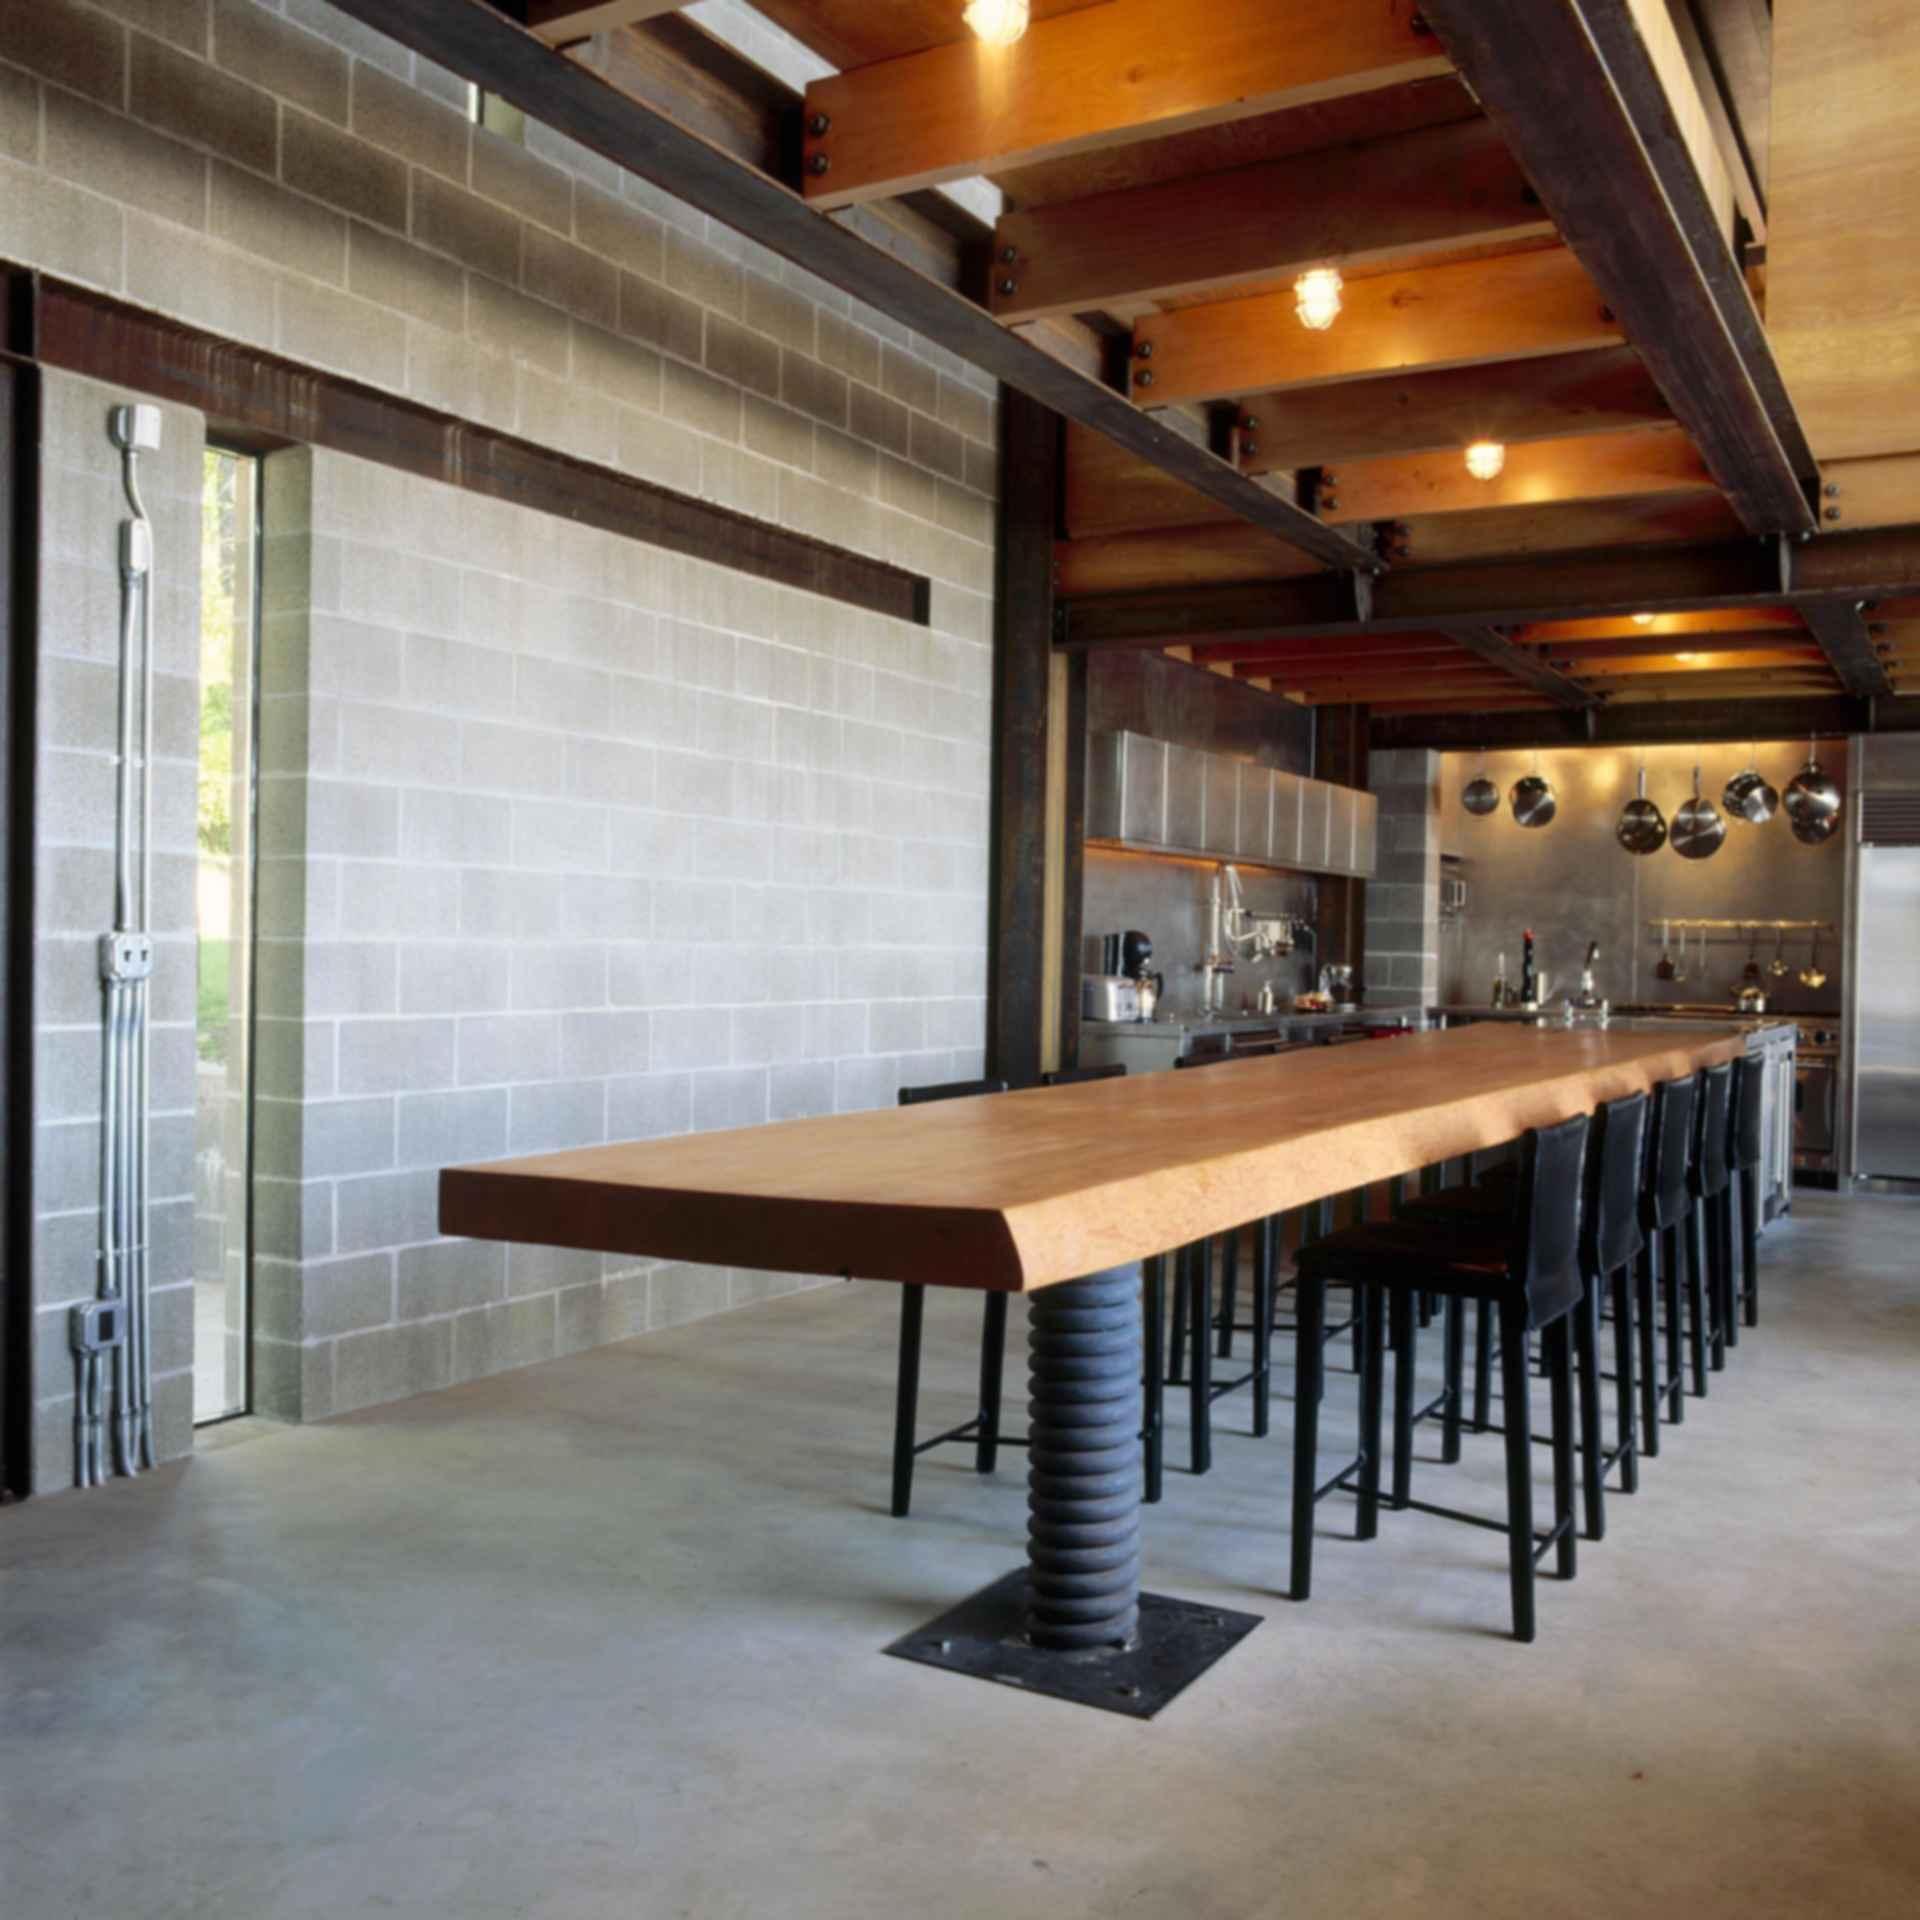 Chicken Point Cabin - Interior/Table